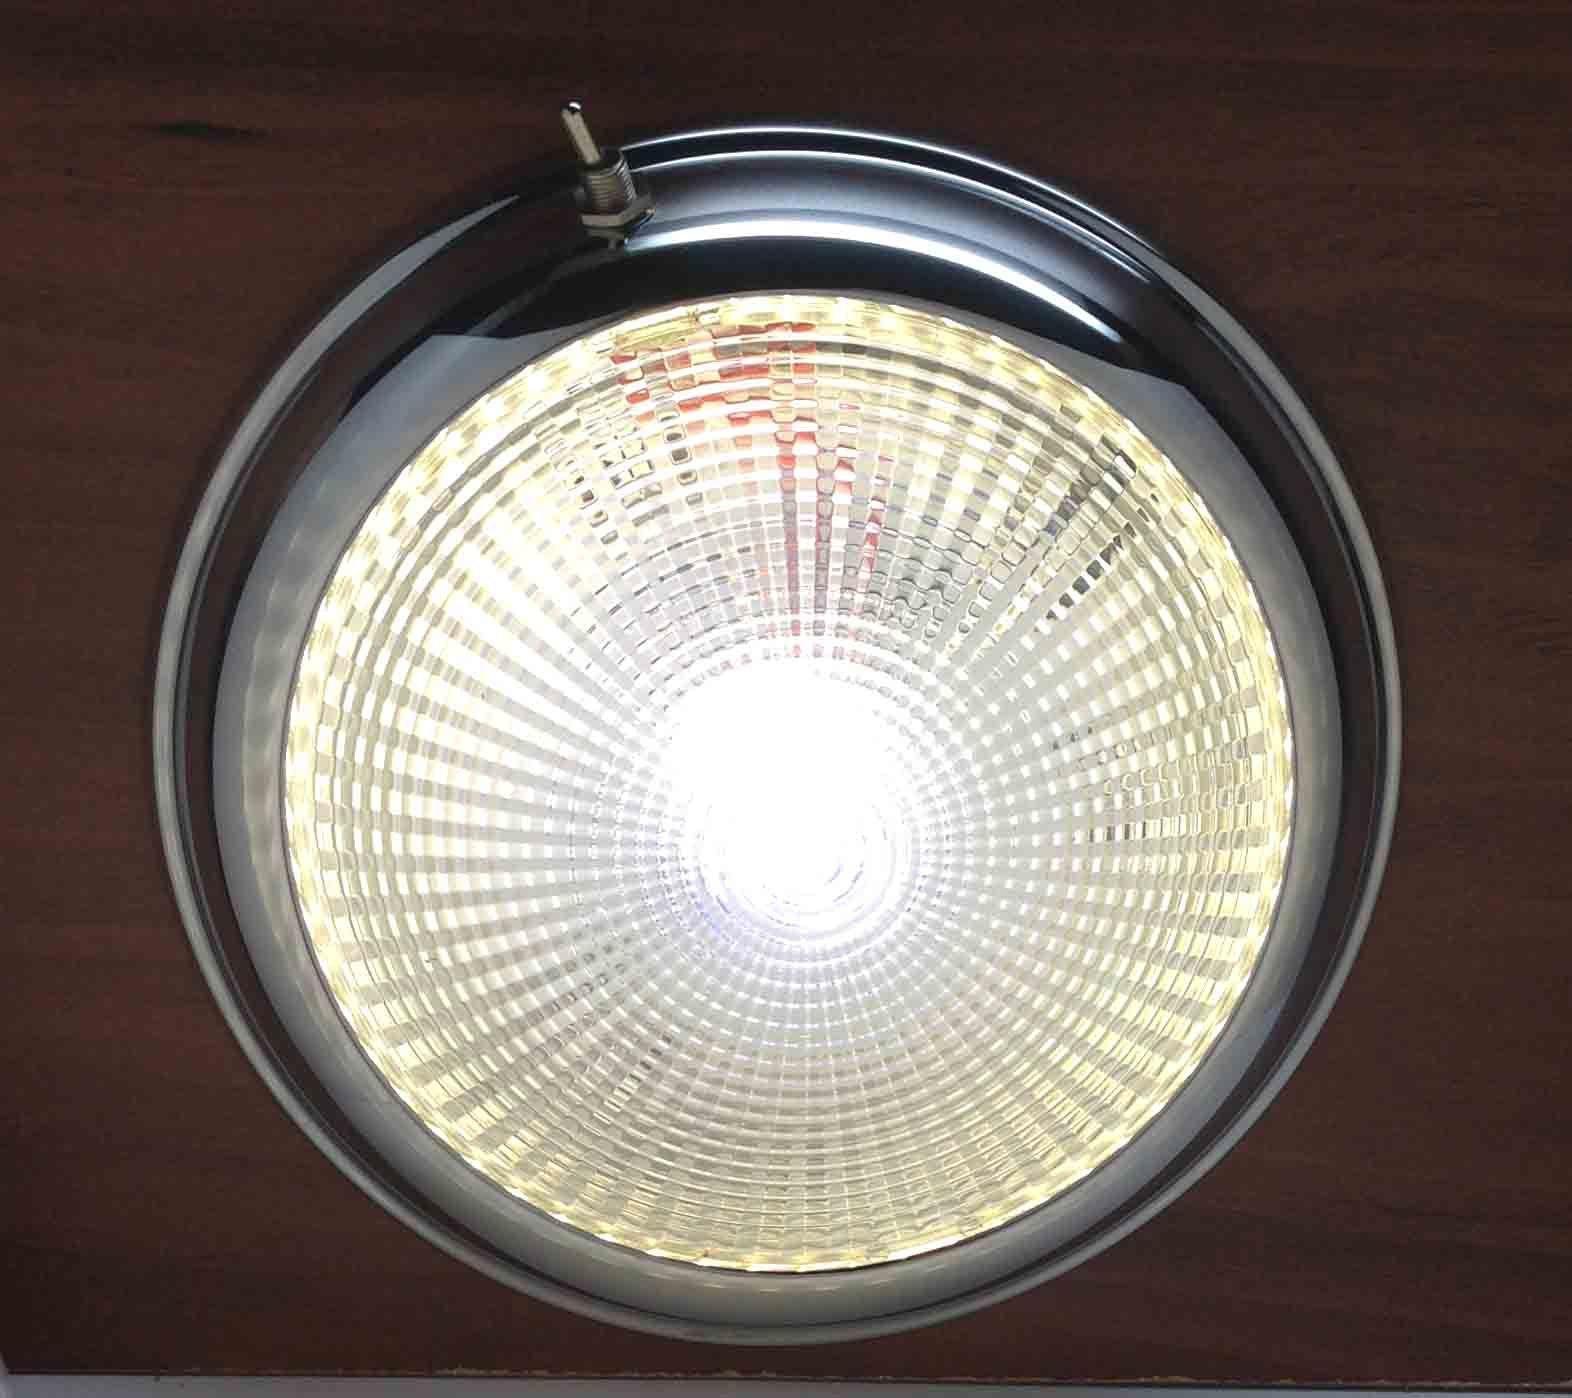 LED Dome Light Marine and RV Lighting & Accessories - Pactrade MarineTAGLINE